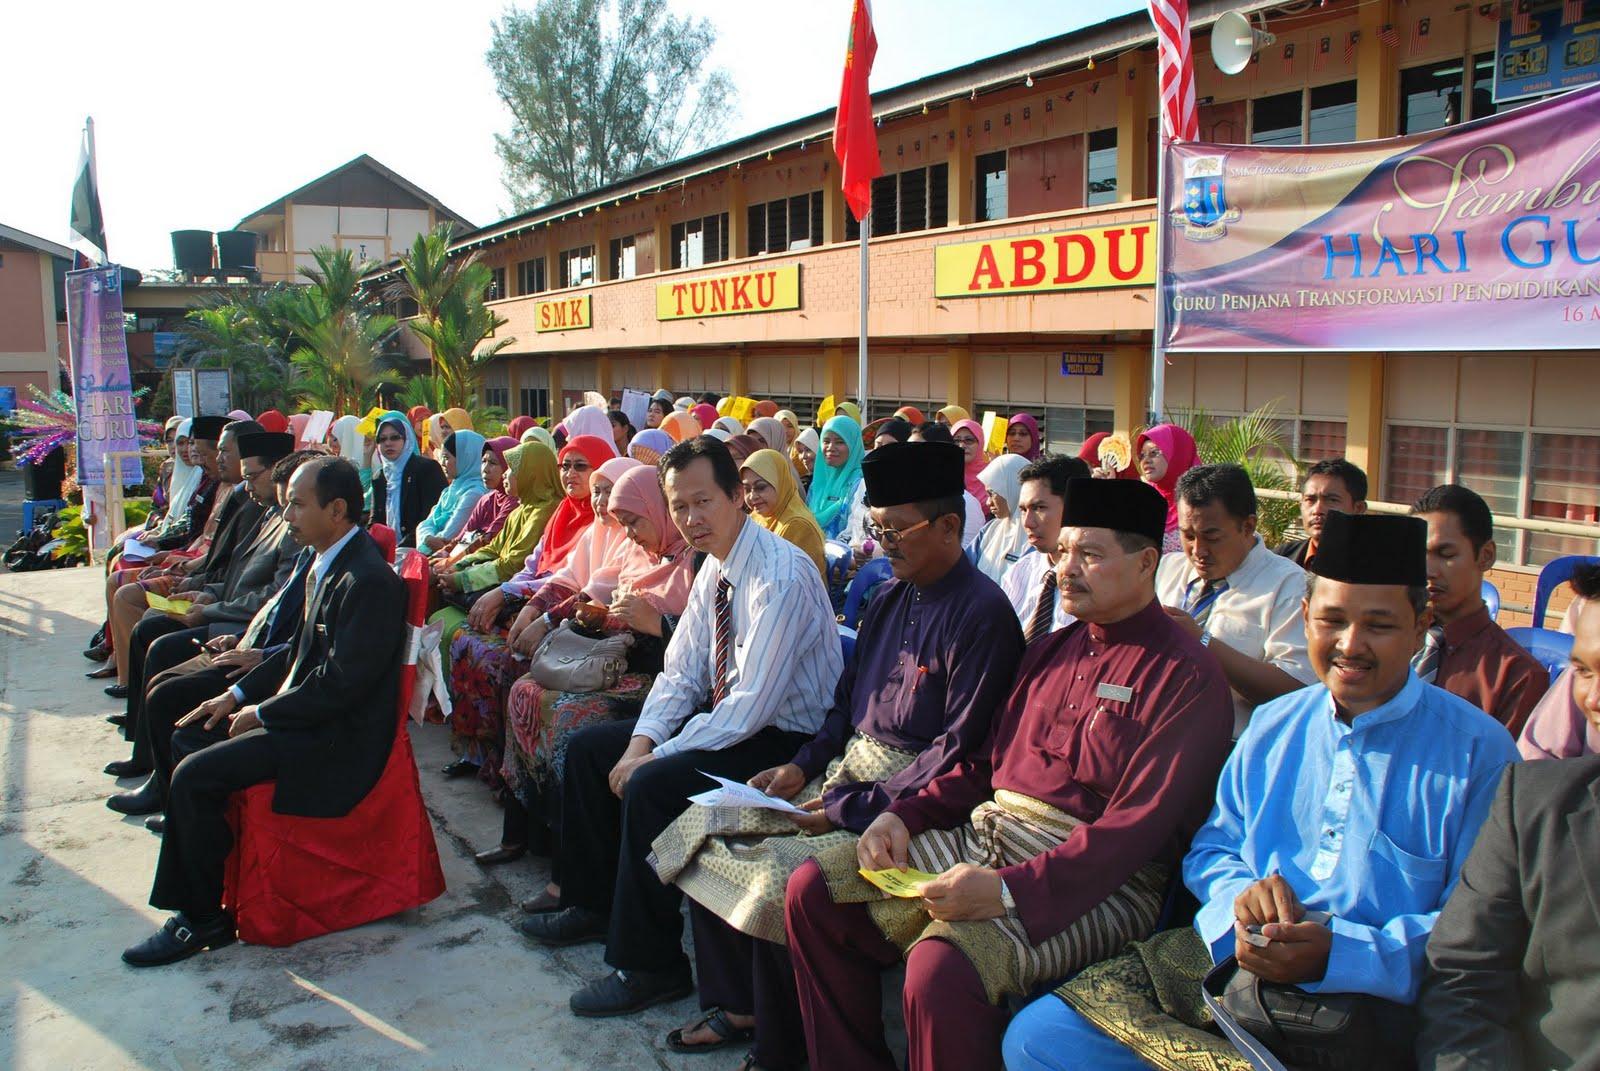 Rezalstar Sambutan Hari Guru Star Alor Setar 2011